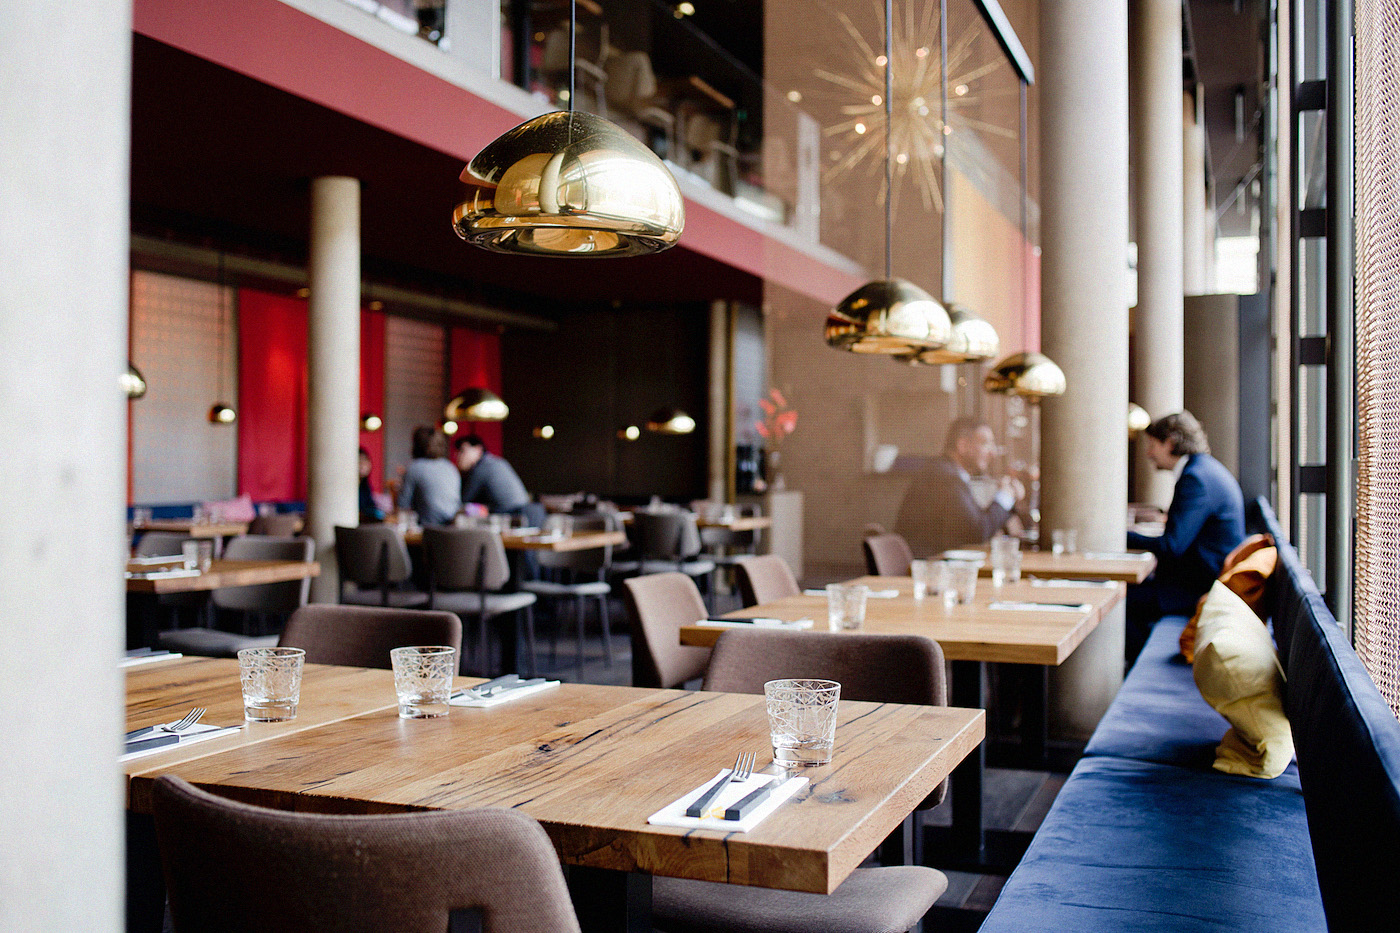 Lunch at The Spice Bazaar –<em>Restaurants in Munich</em>